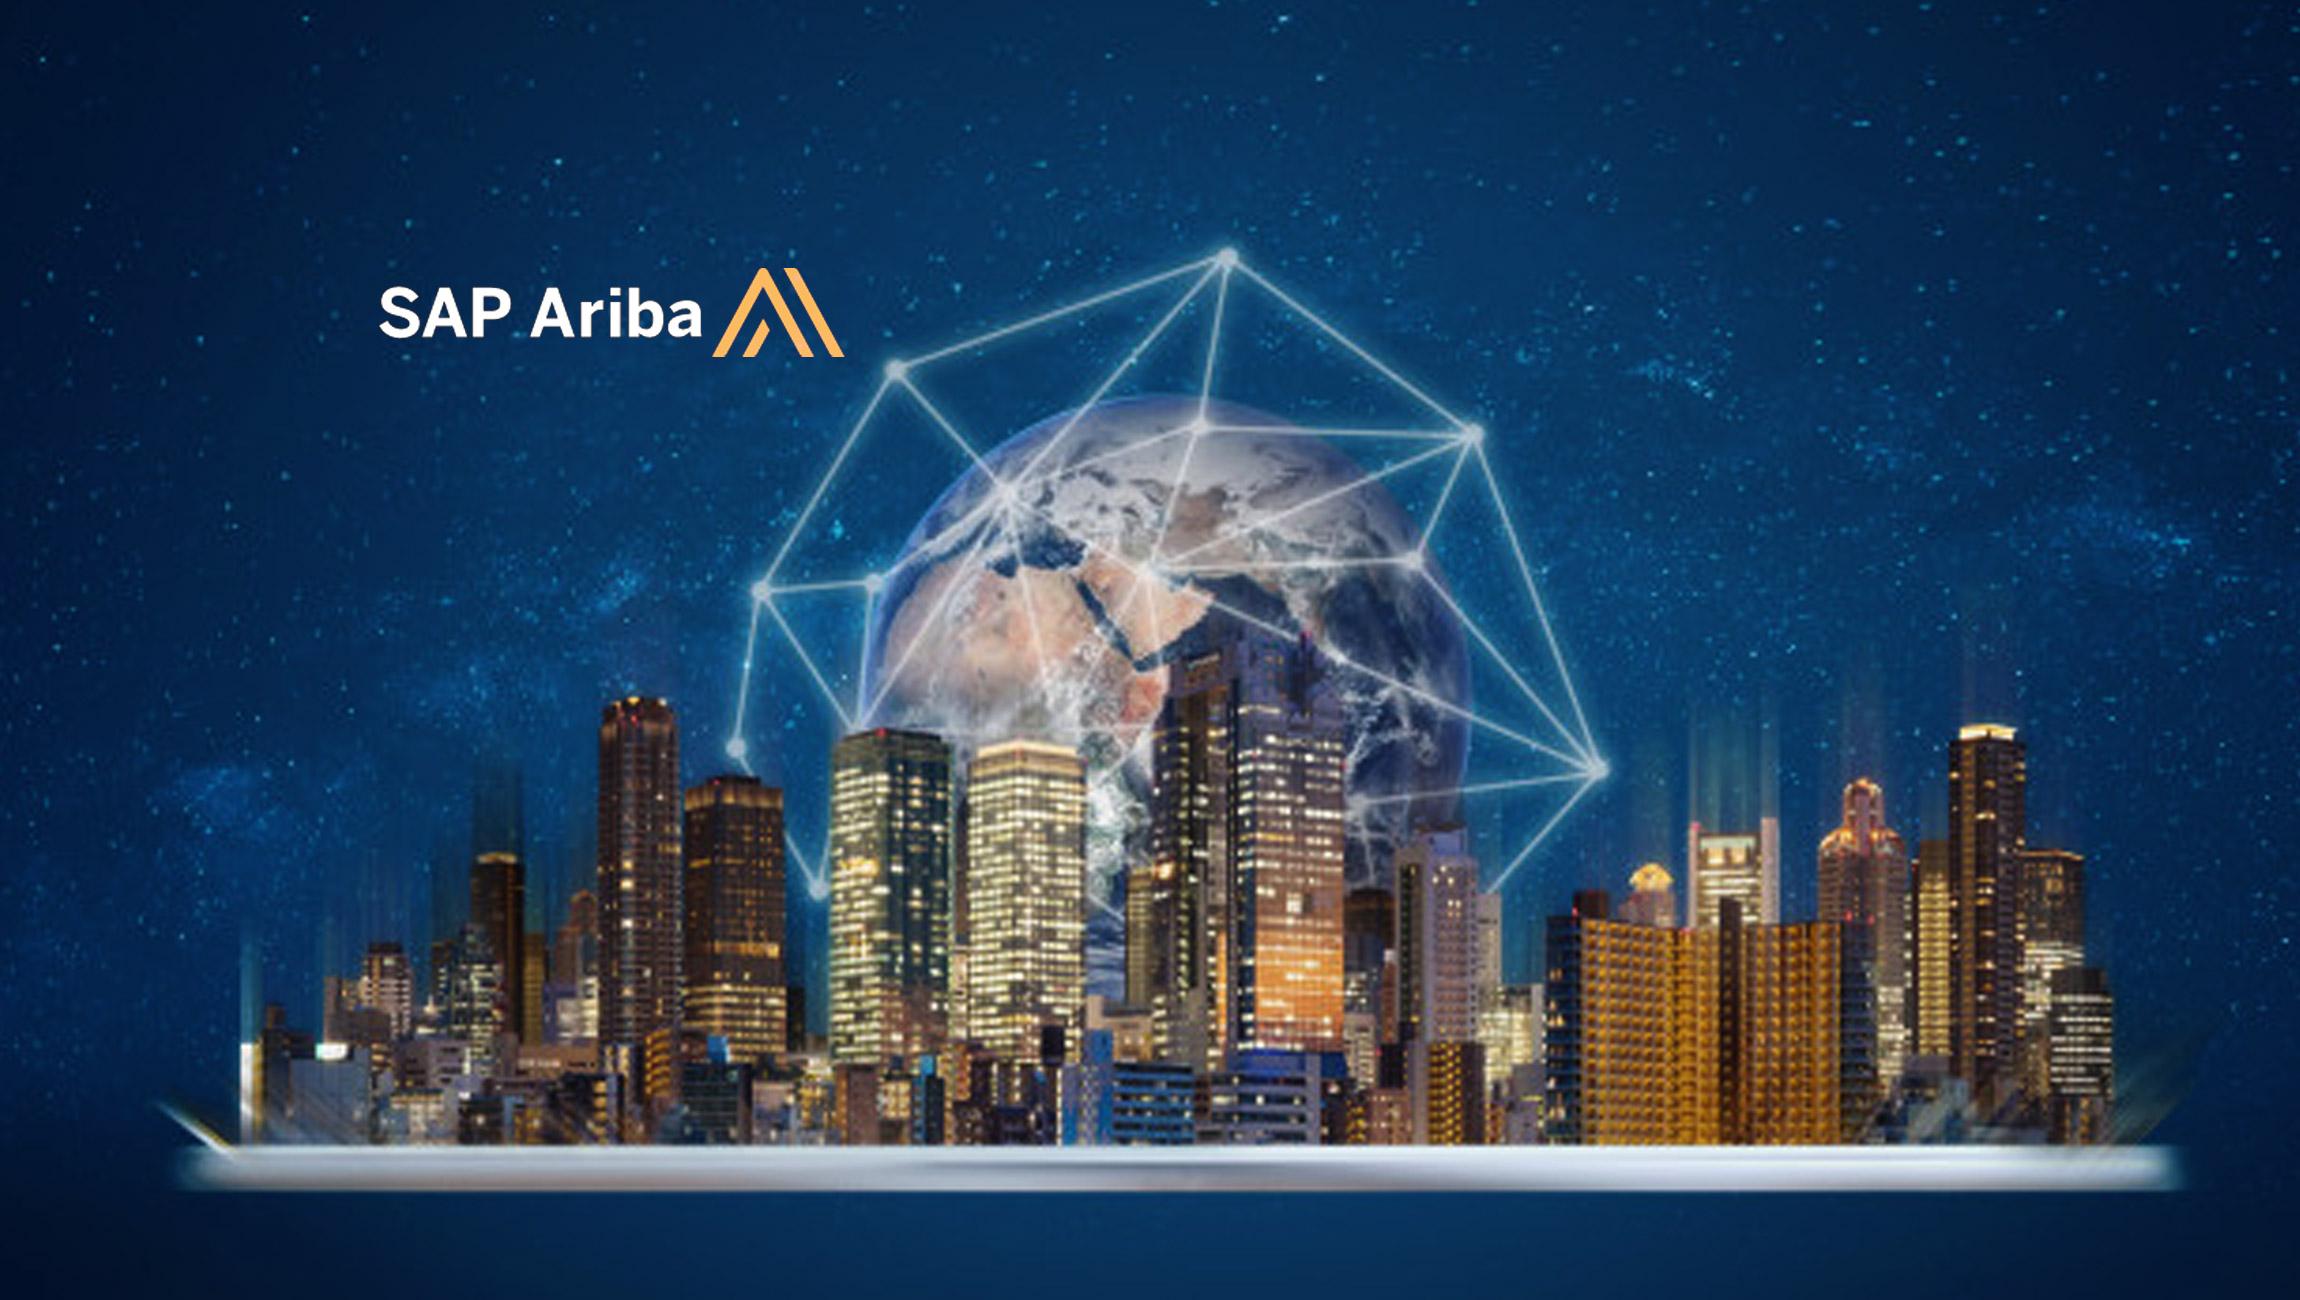 MOL Group Chooses SAP Ariba Solutions to Digitalize Global Procurement